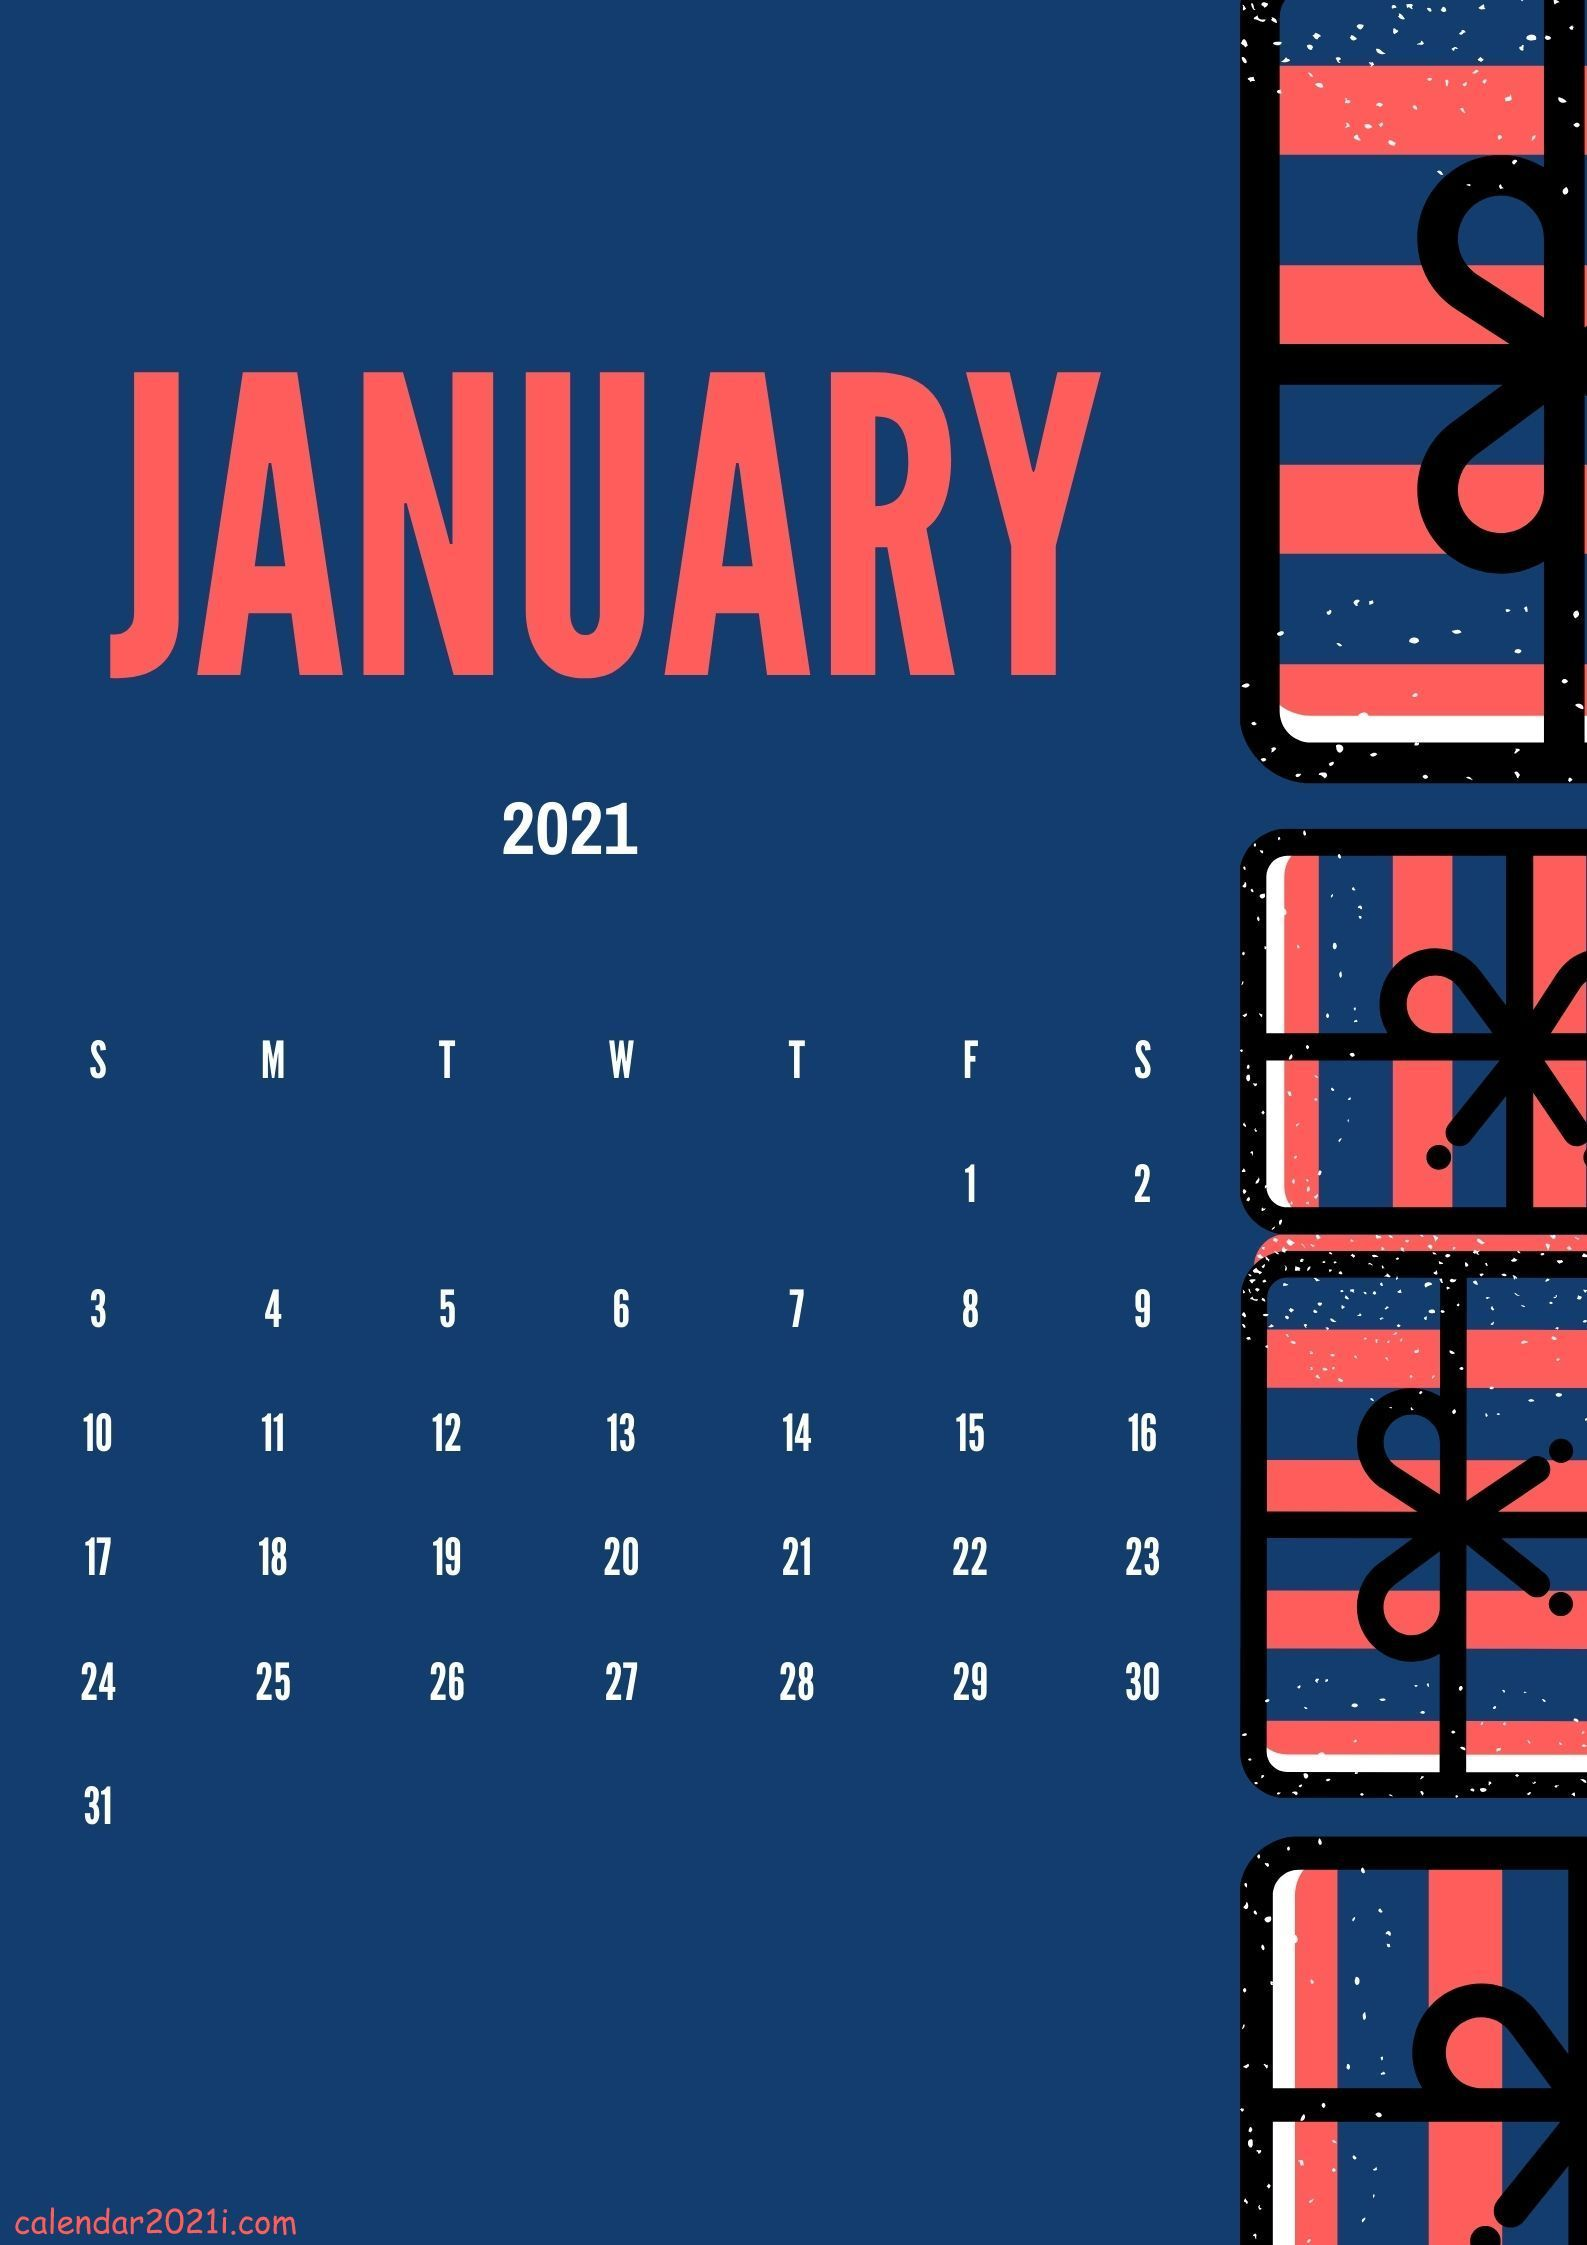 Cute January 2021 calendar design layout DIY ideas Calendar 1587x2245